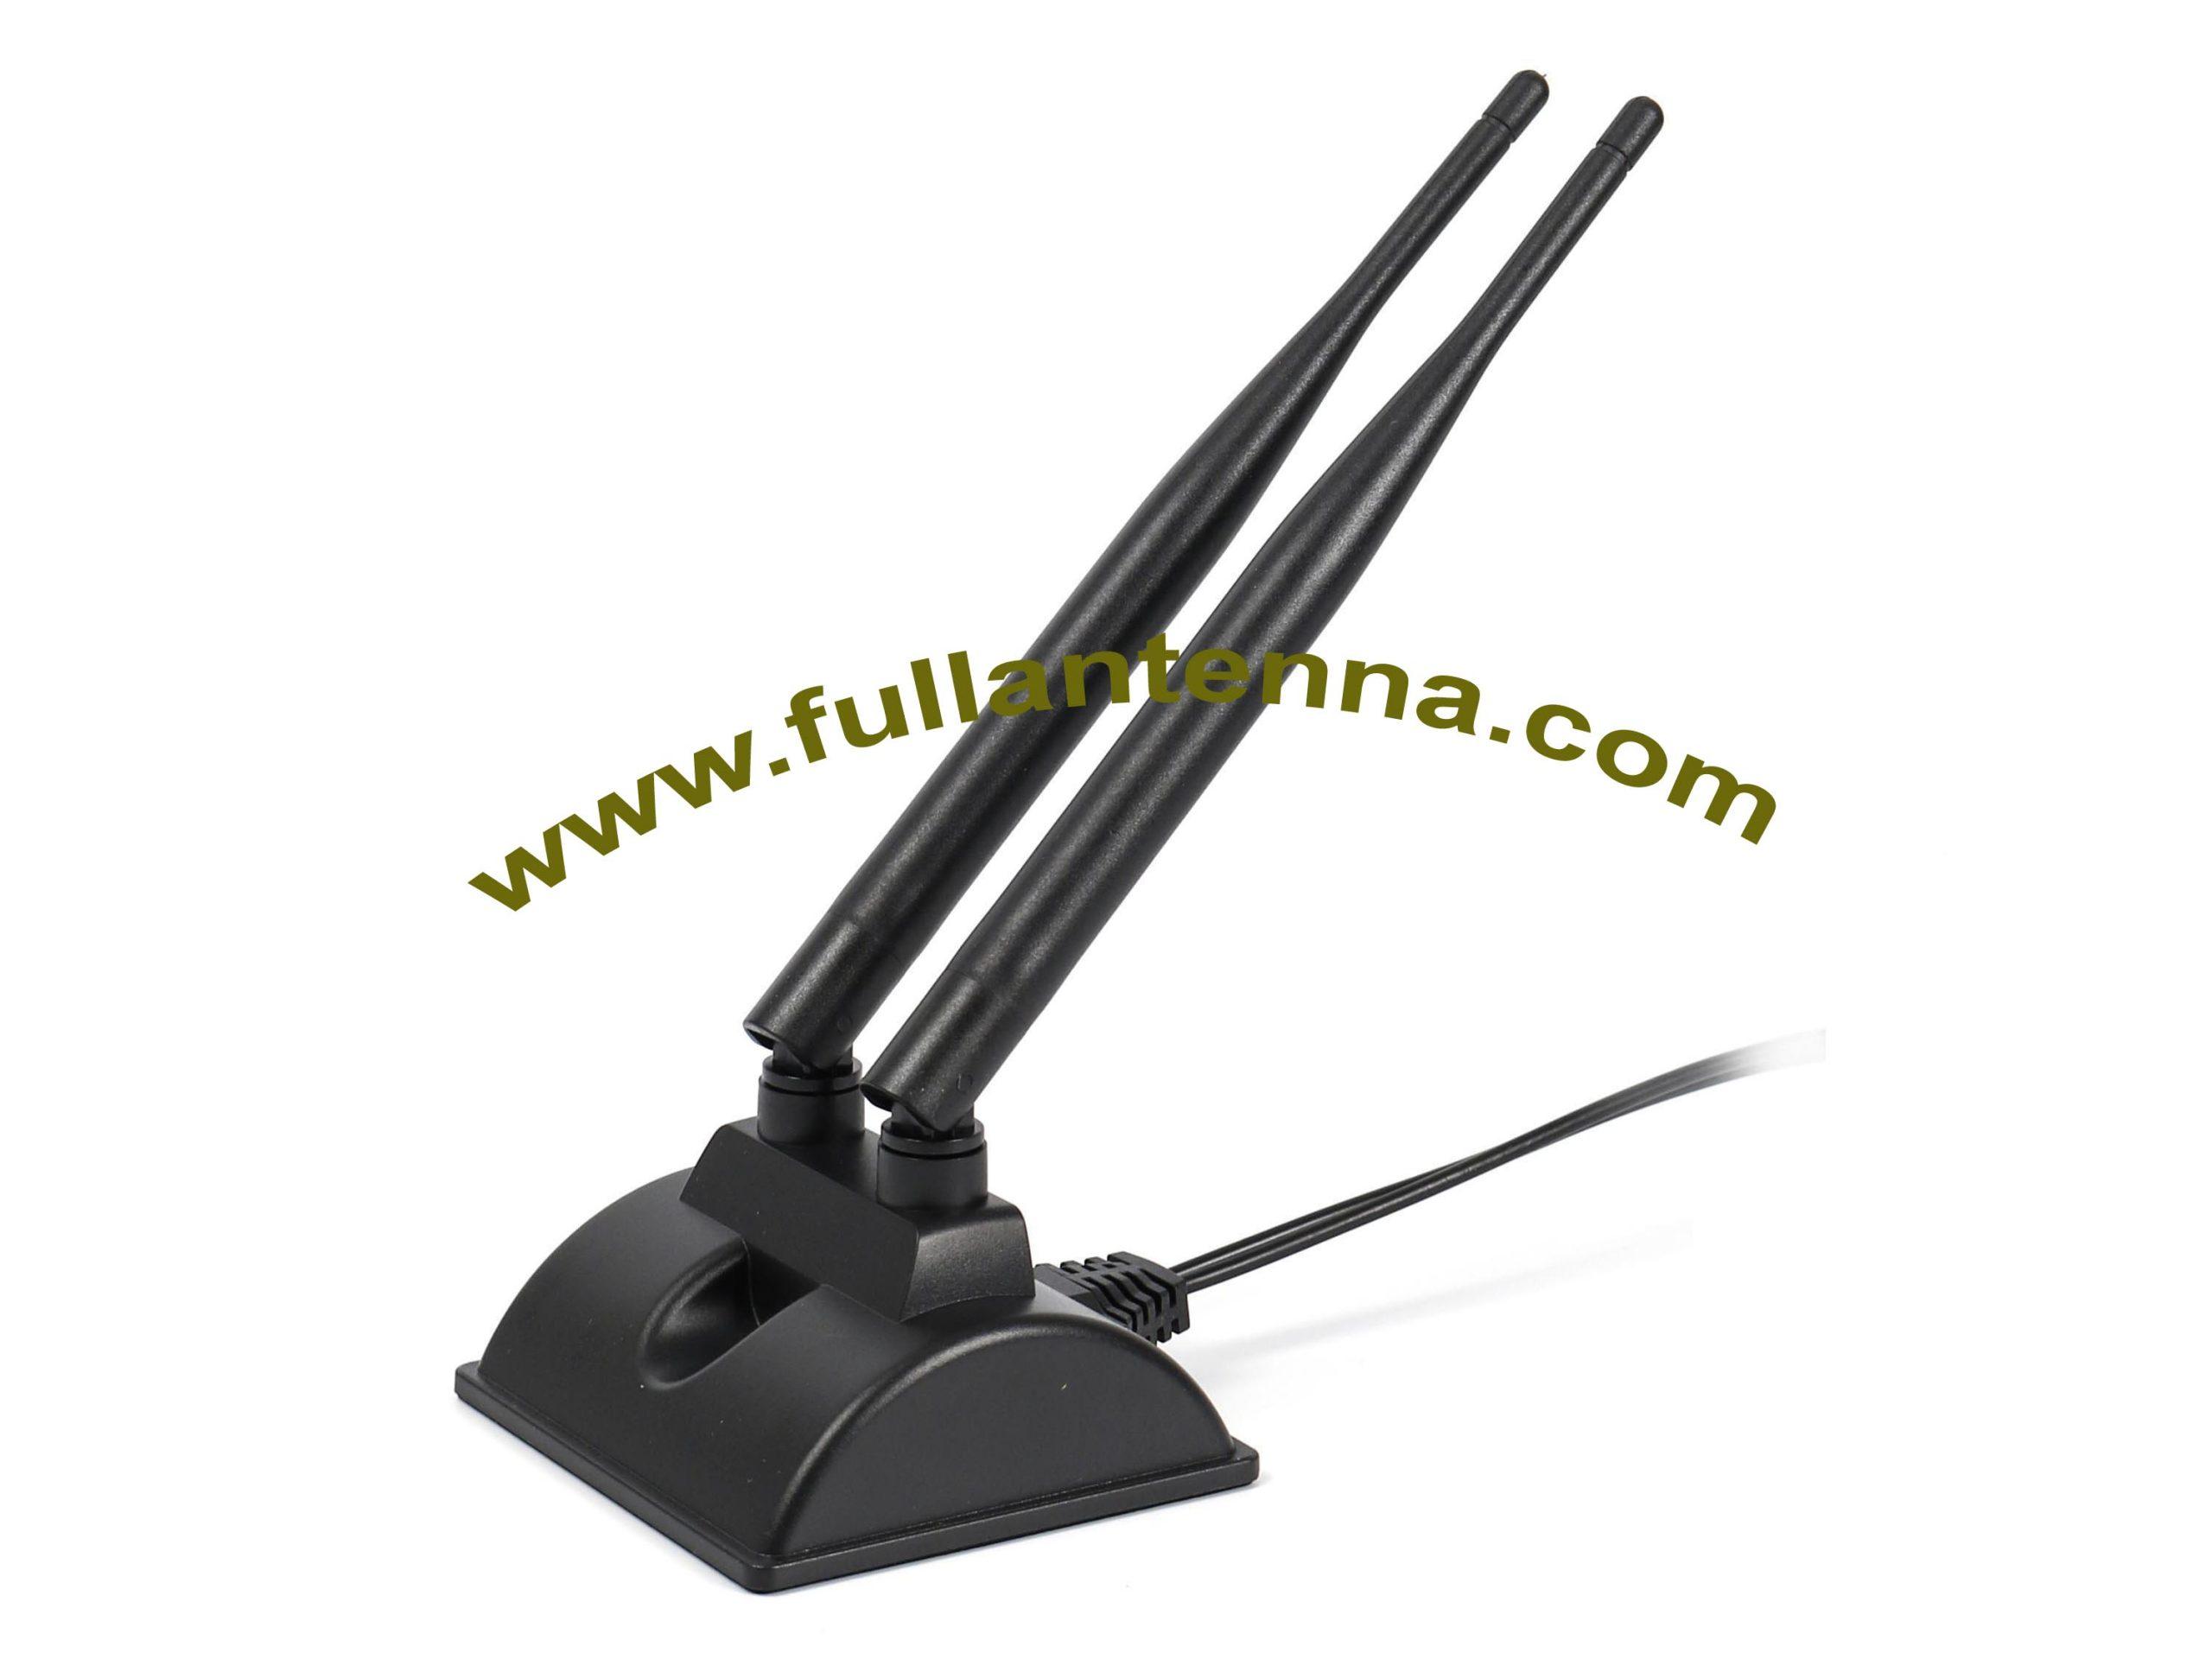 P/N:FA2.45.8G.20,WiFi/2.4G 5.8G External Antenna,2.4G 5.8G antenna for  WiFi Router easy mount